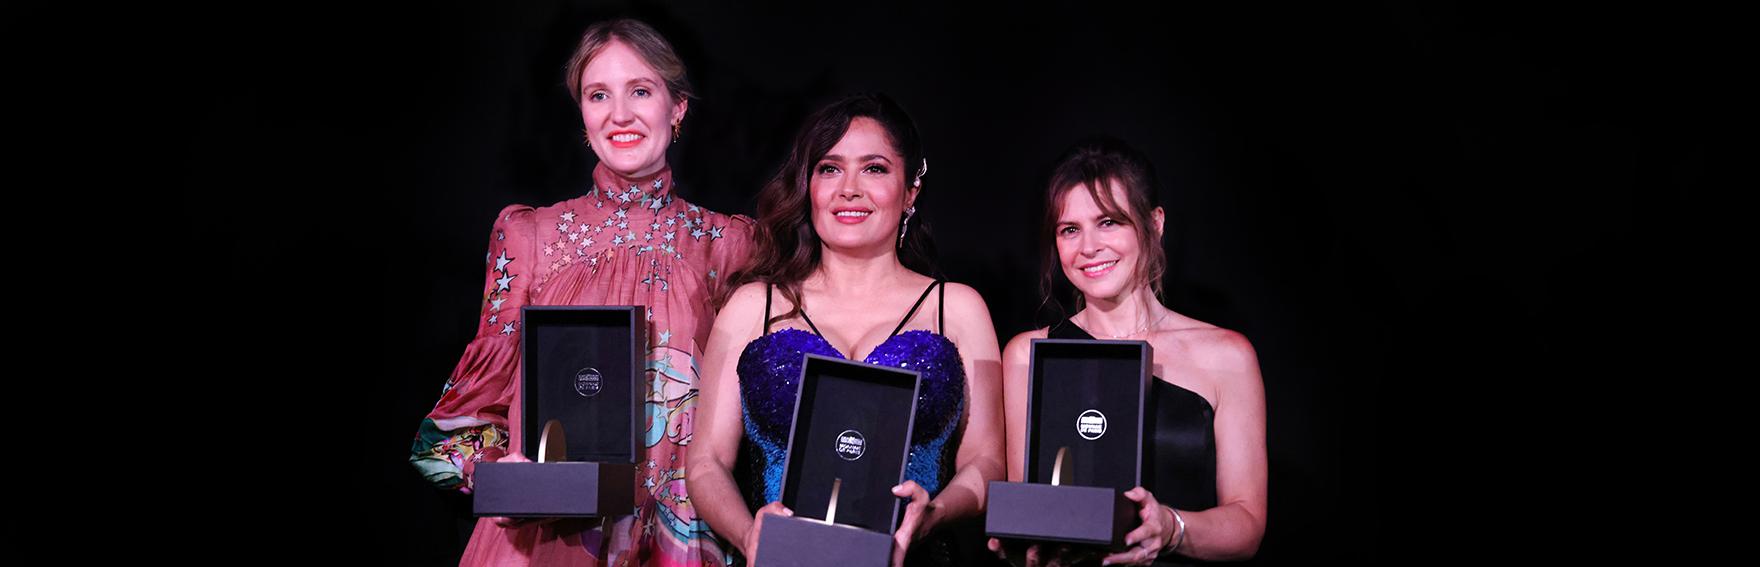 Shannon Murphy, Salma Hayek Pinault et Maura Delpero